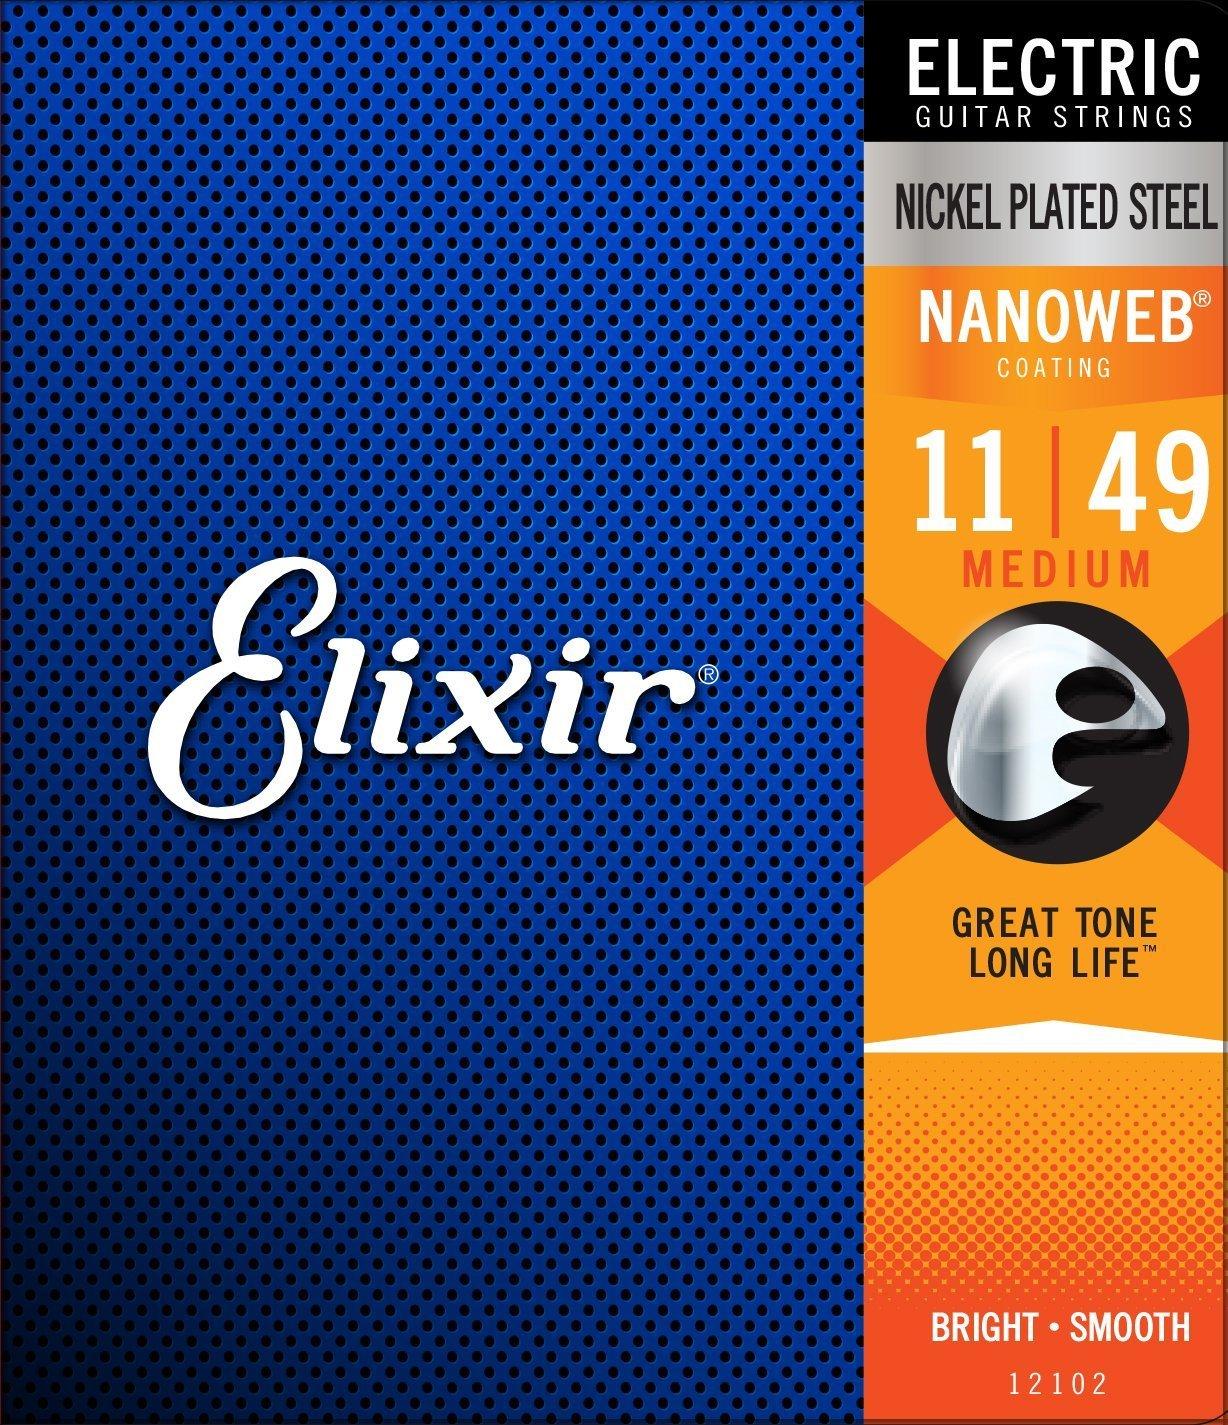 Elixir Strings Electric Guitar Strings w NANOWEB Coating, Medium (.011-.049) KMC Music Inc 12102